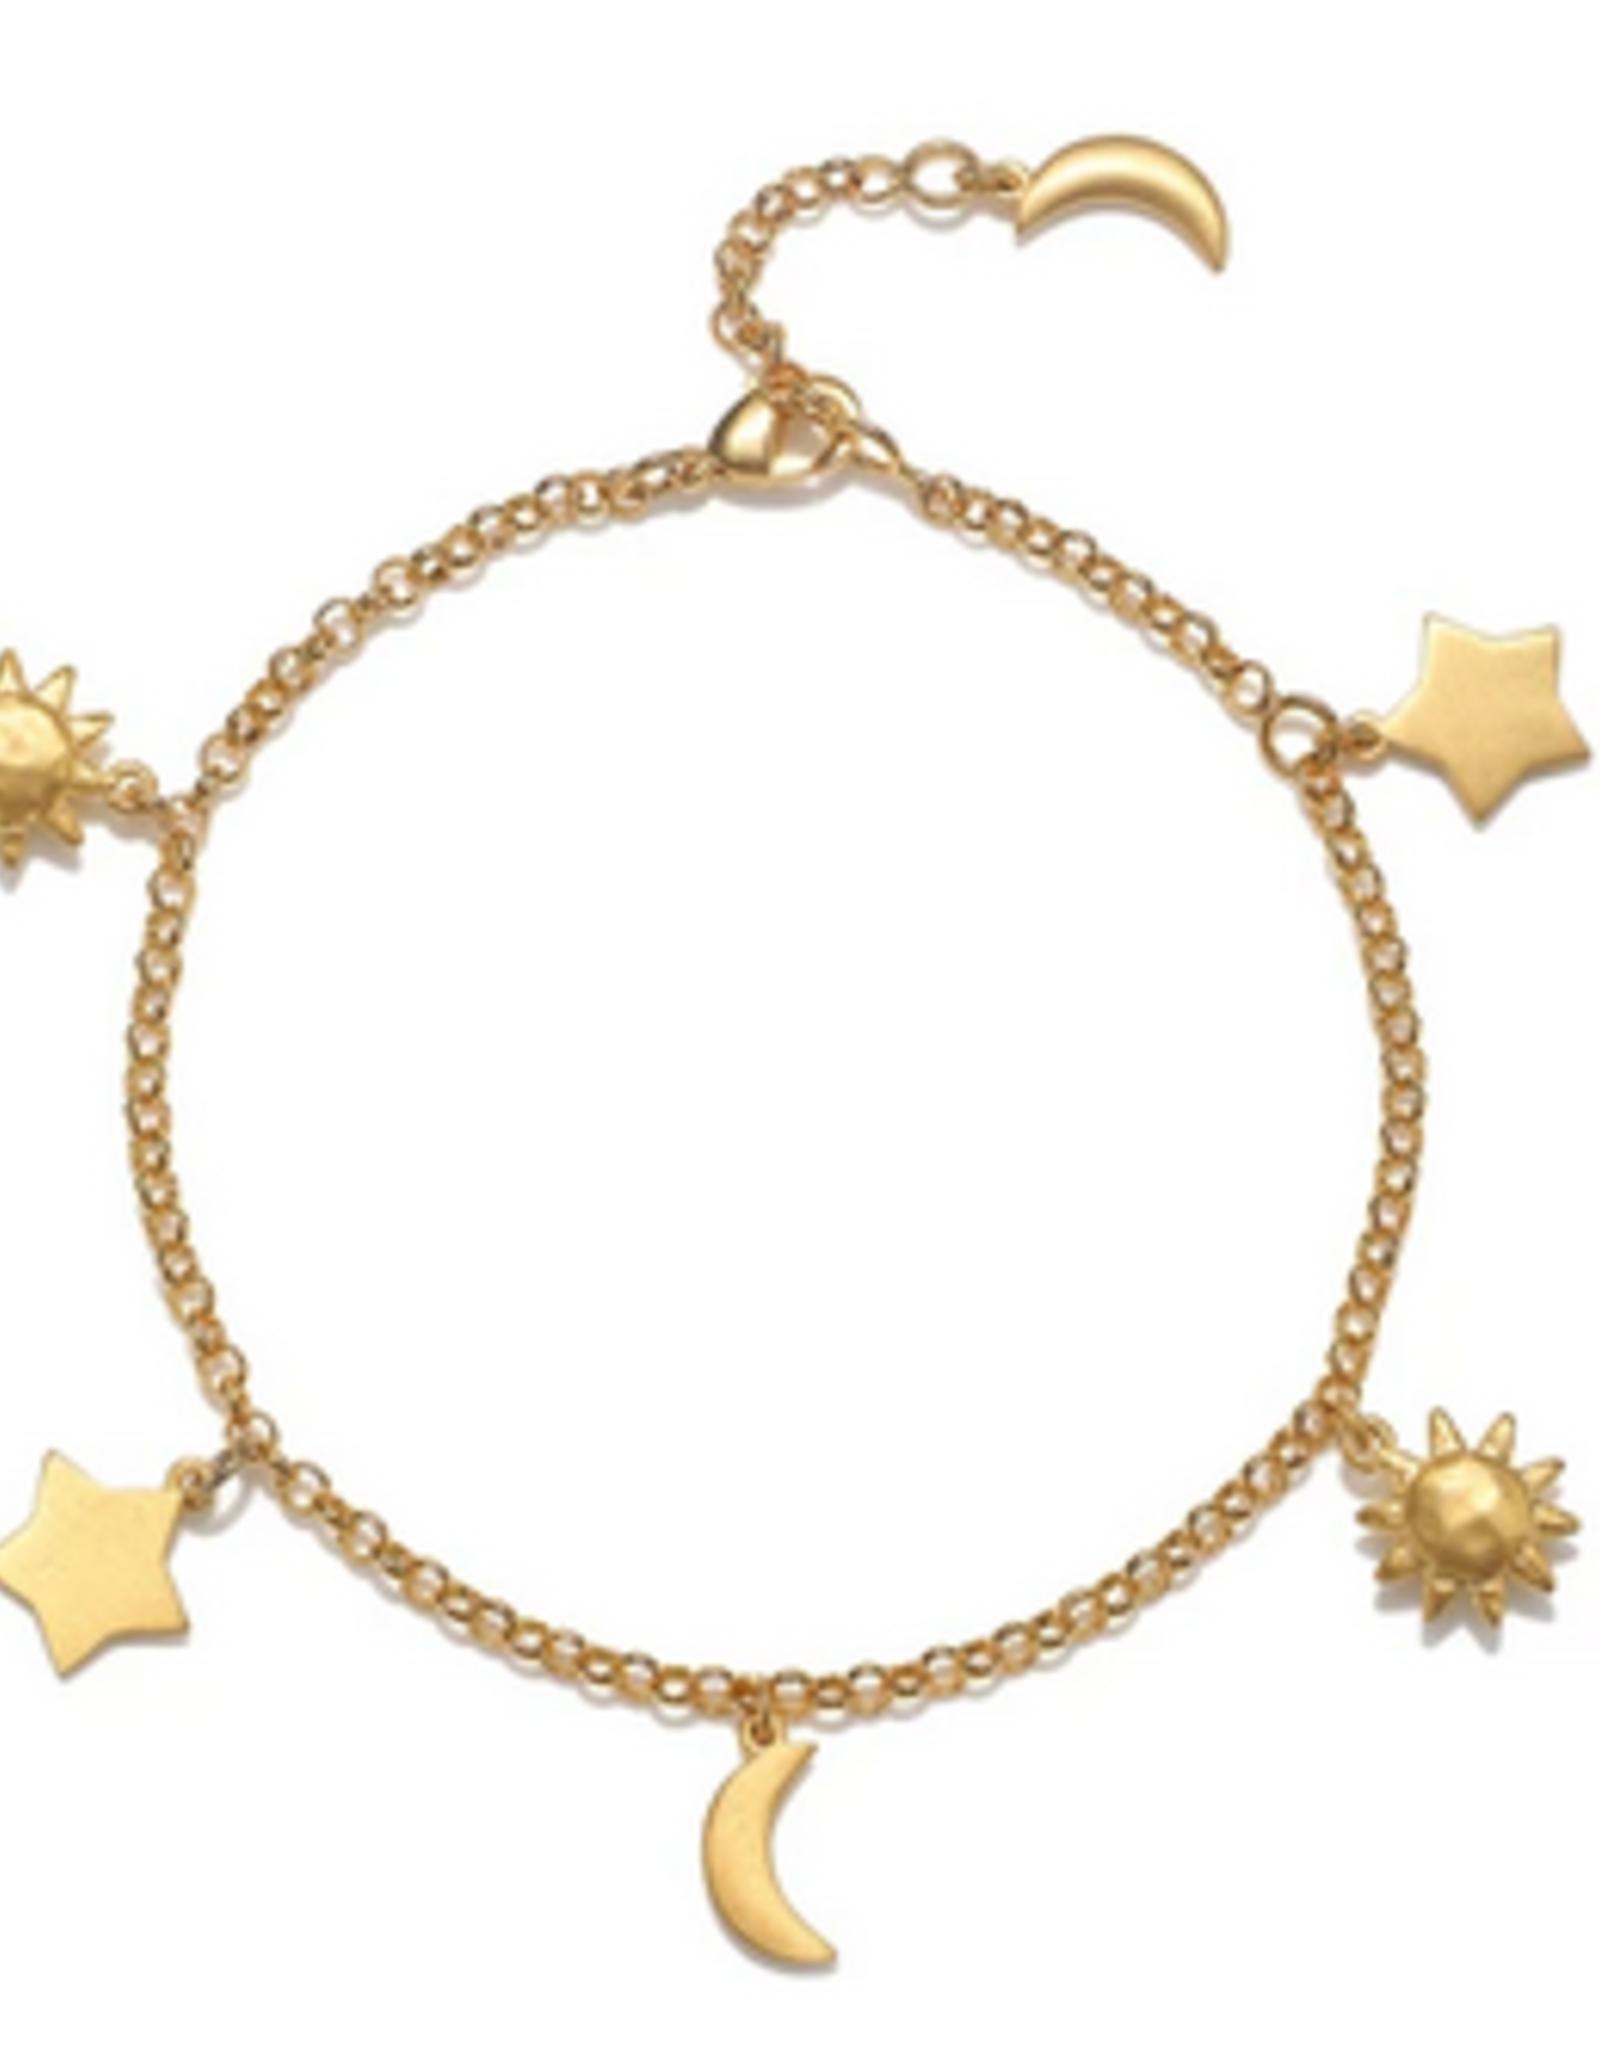 SATYA Jewelry Beyond Boundaries Charm Bracelet